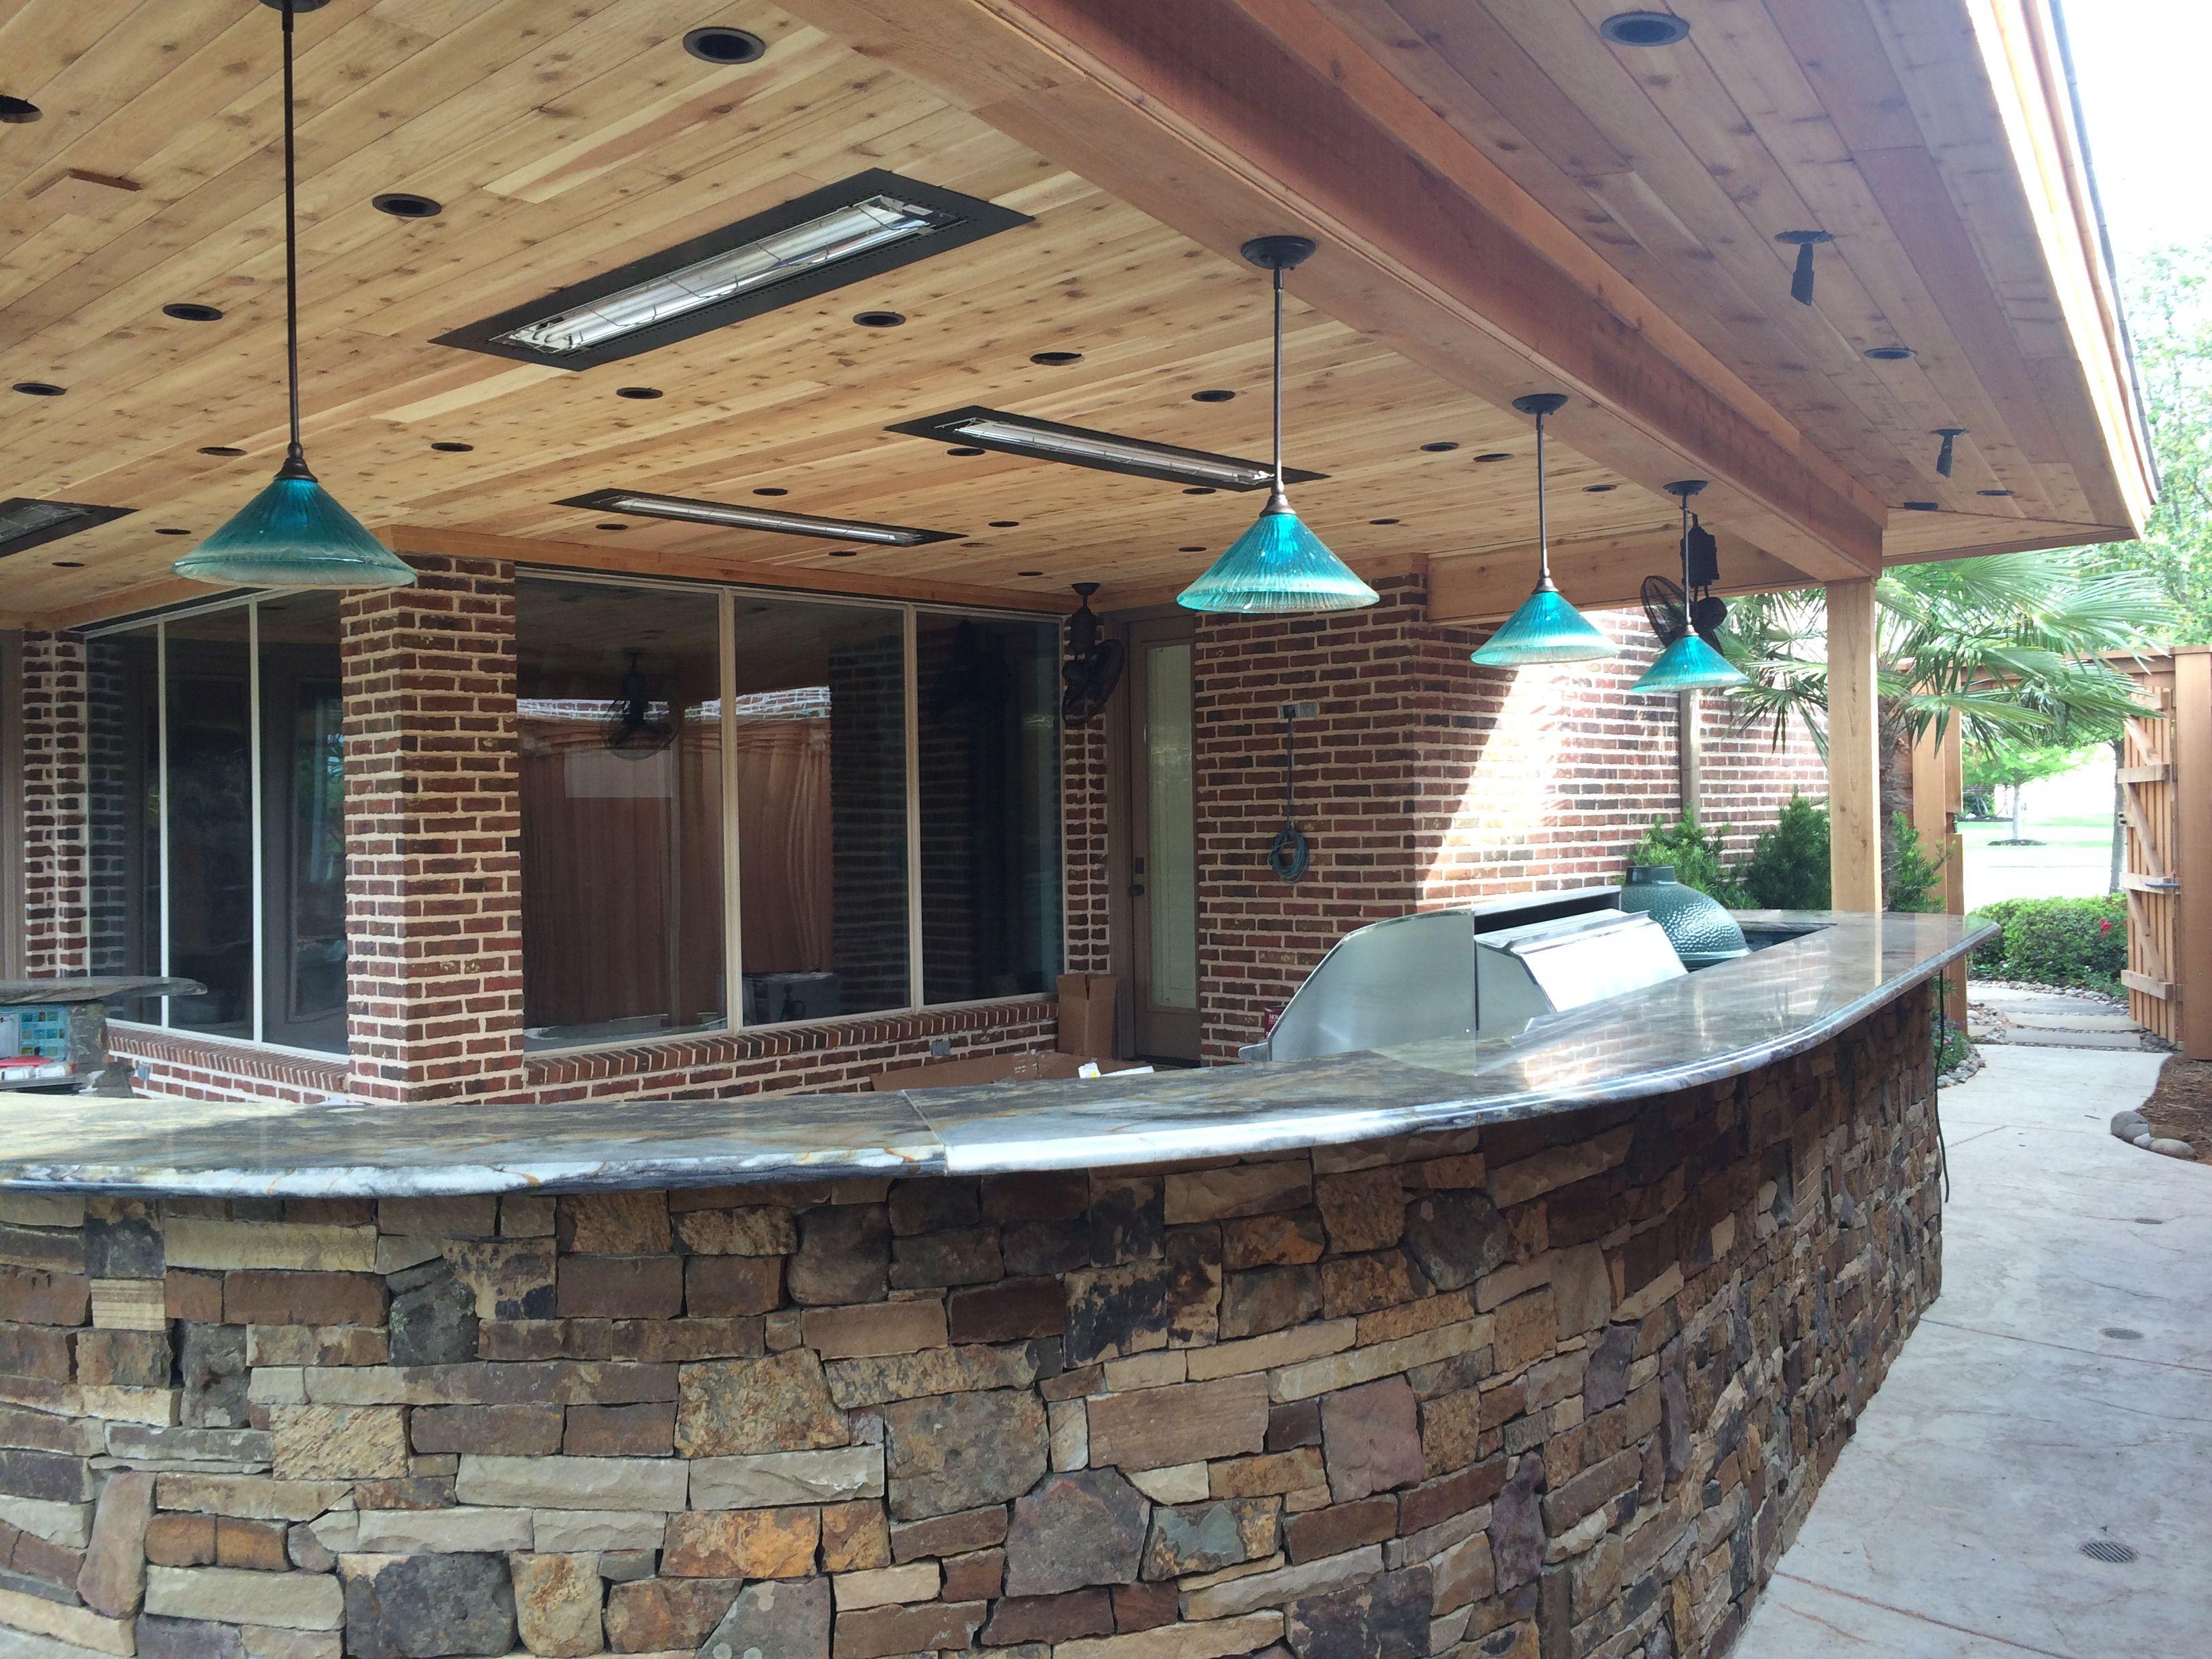 modern light fixtures installed by dallas landscap outdoor kitchen lighting Dallas Landscape Lighting installed these Toltec light fixtures in our Rockwall TX customer s outdoor kitchen